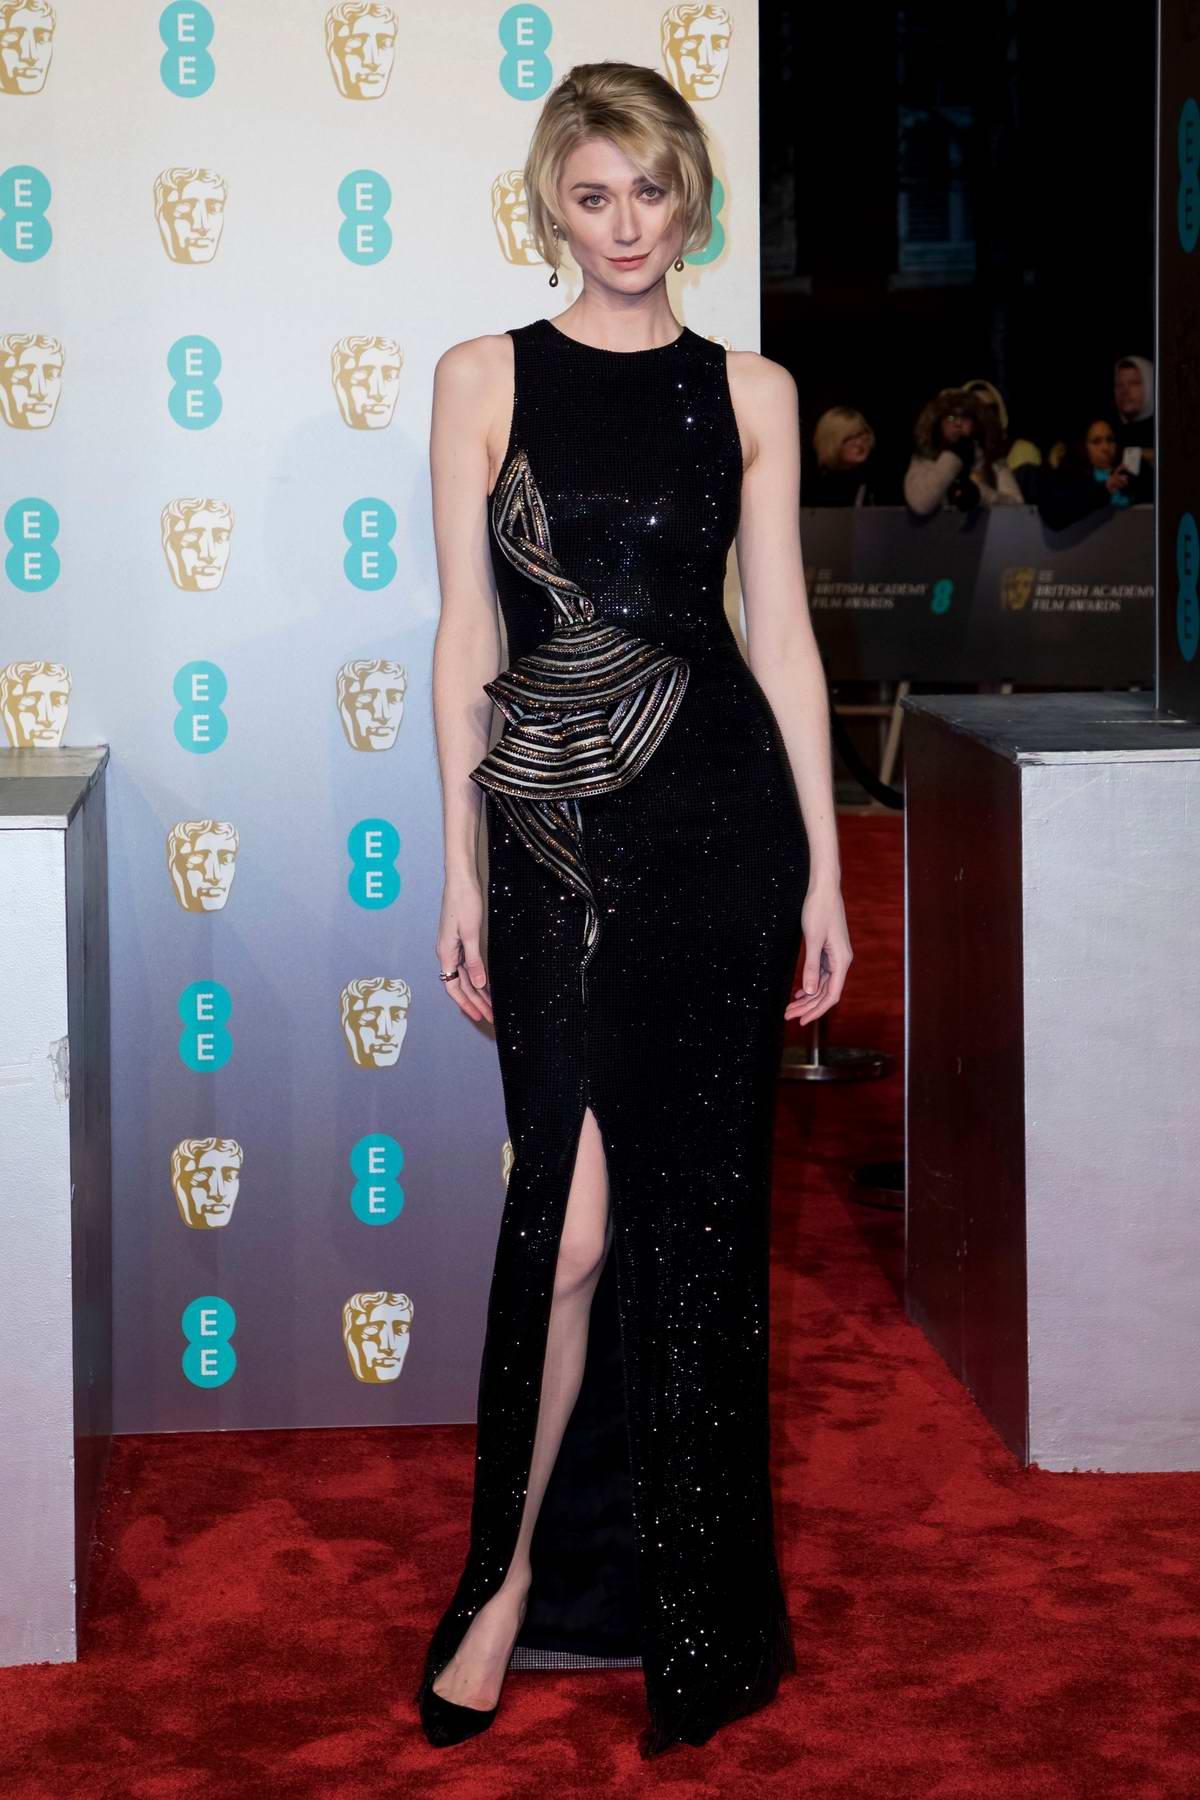 Elizabeth Debicki attends the 72nd EE British Academy Film Awards (BAFTA 2019) at Royal Albert Hall in London, UK